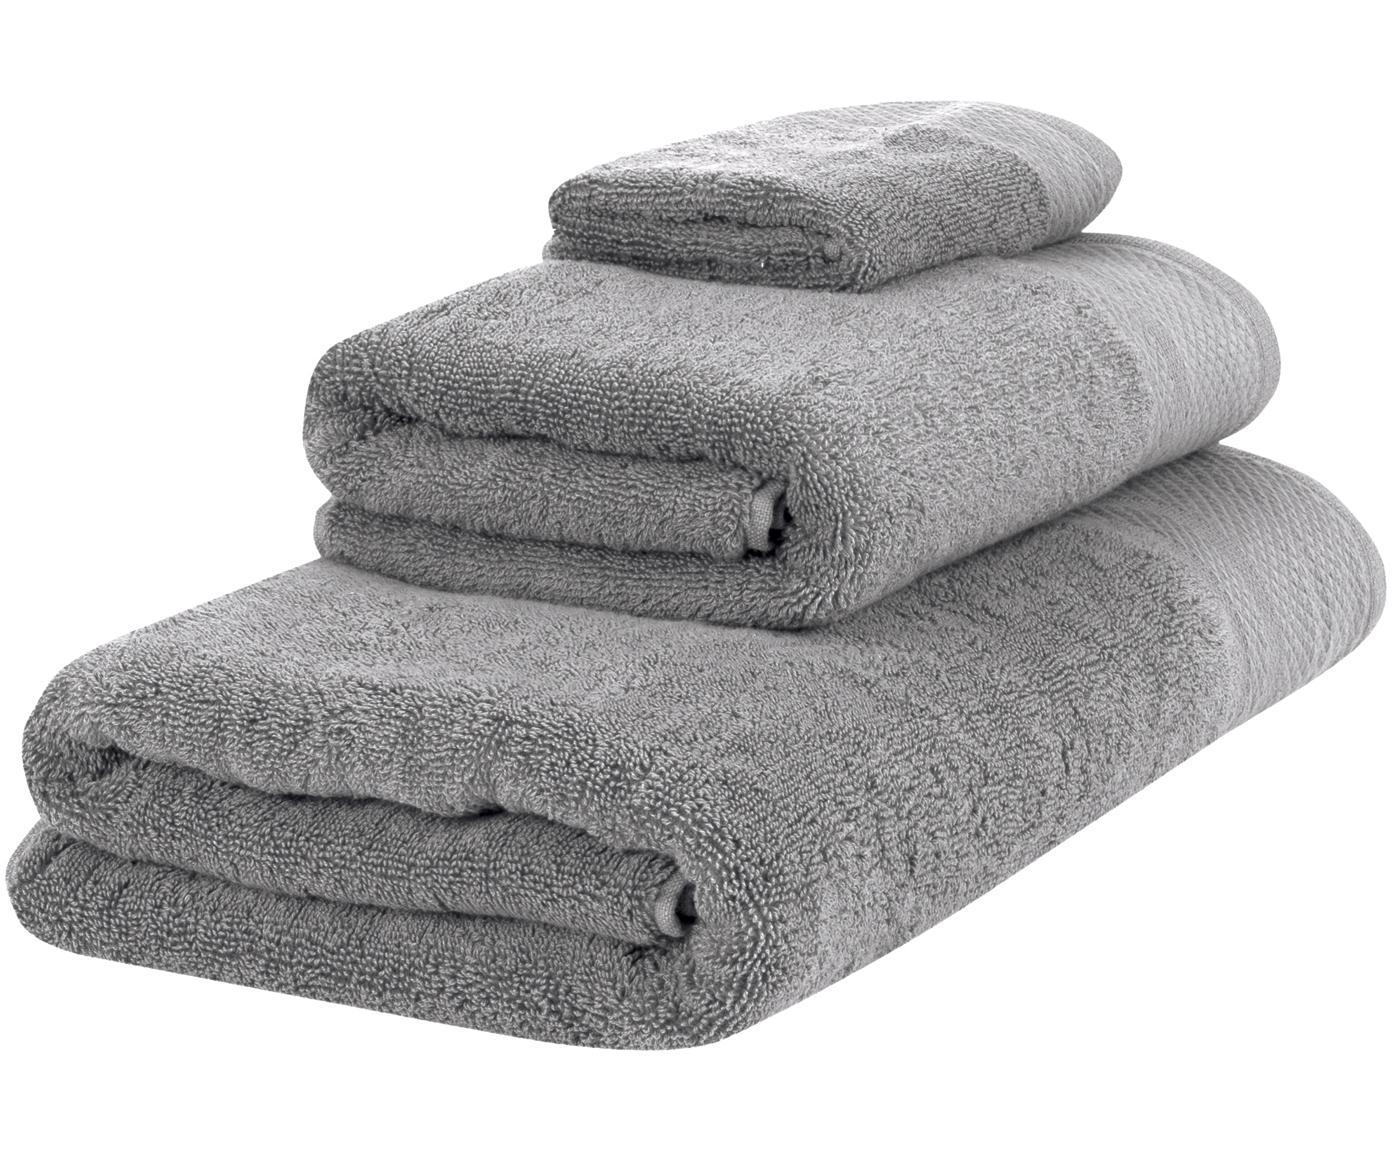 Set de toallas Premium, 3pzas., 100%algodón Gramaje superior 600g/m², Gris oscuro, Tamaños diferentes